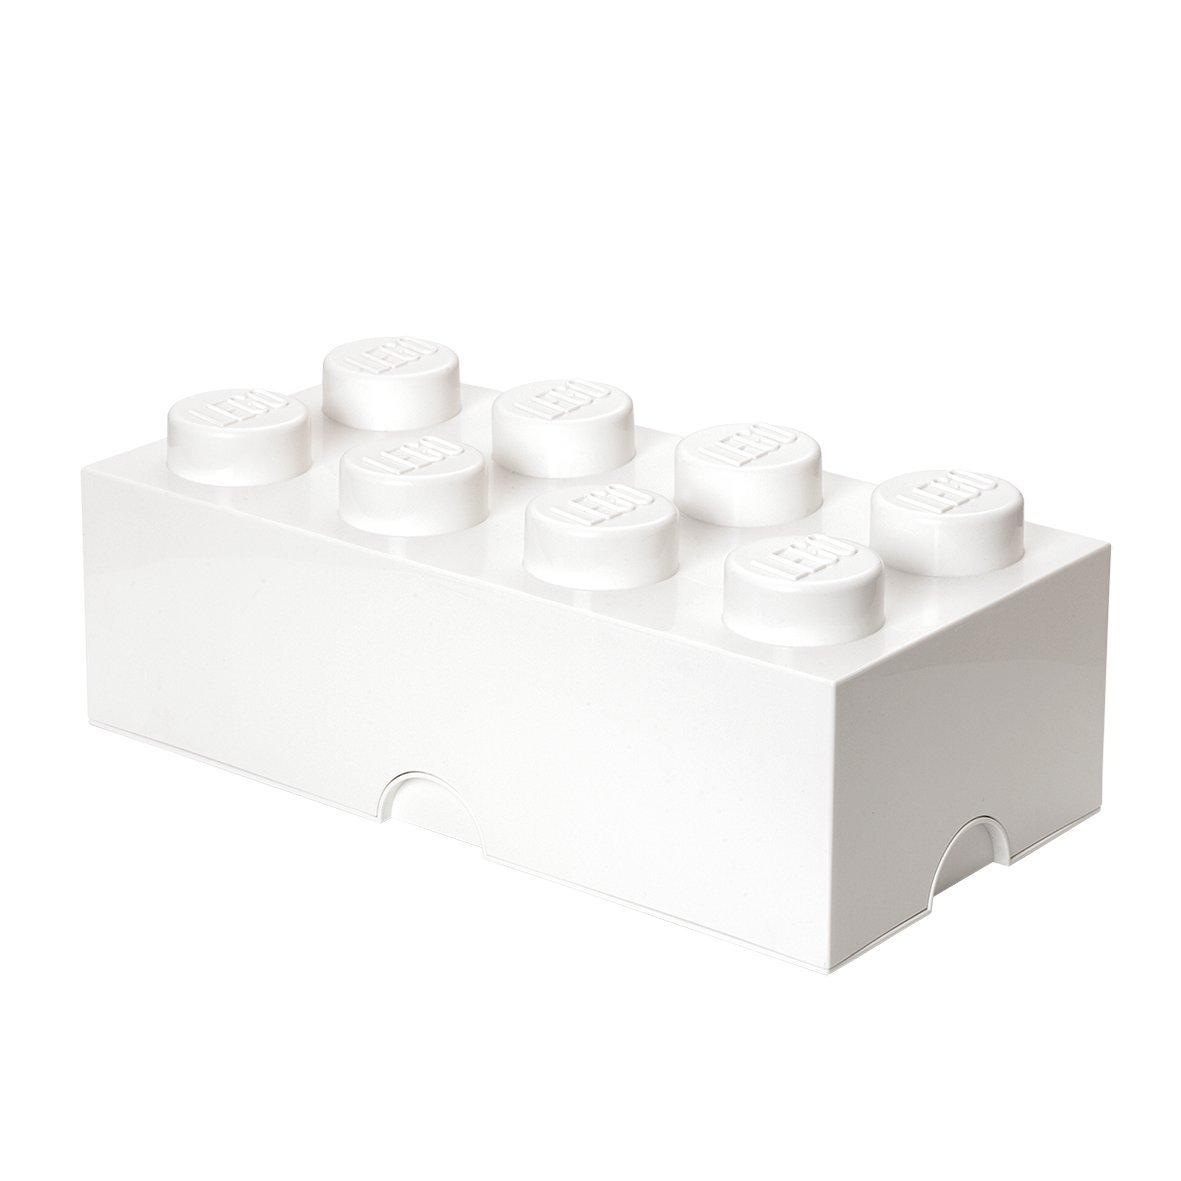 LEGO Storage Box Brick 8 White by LEGO